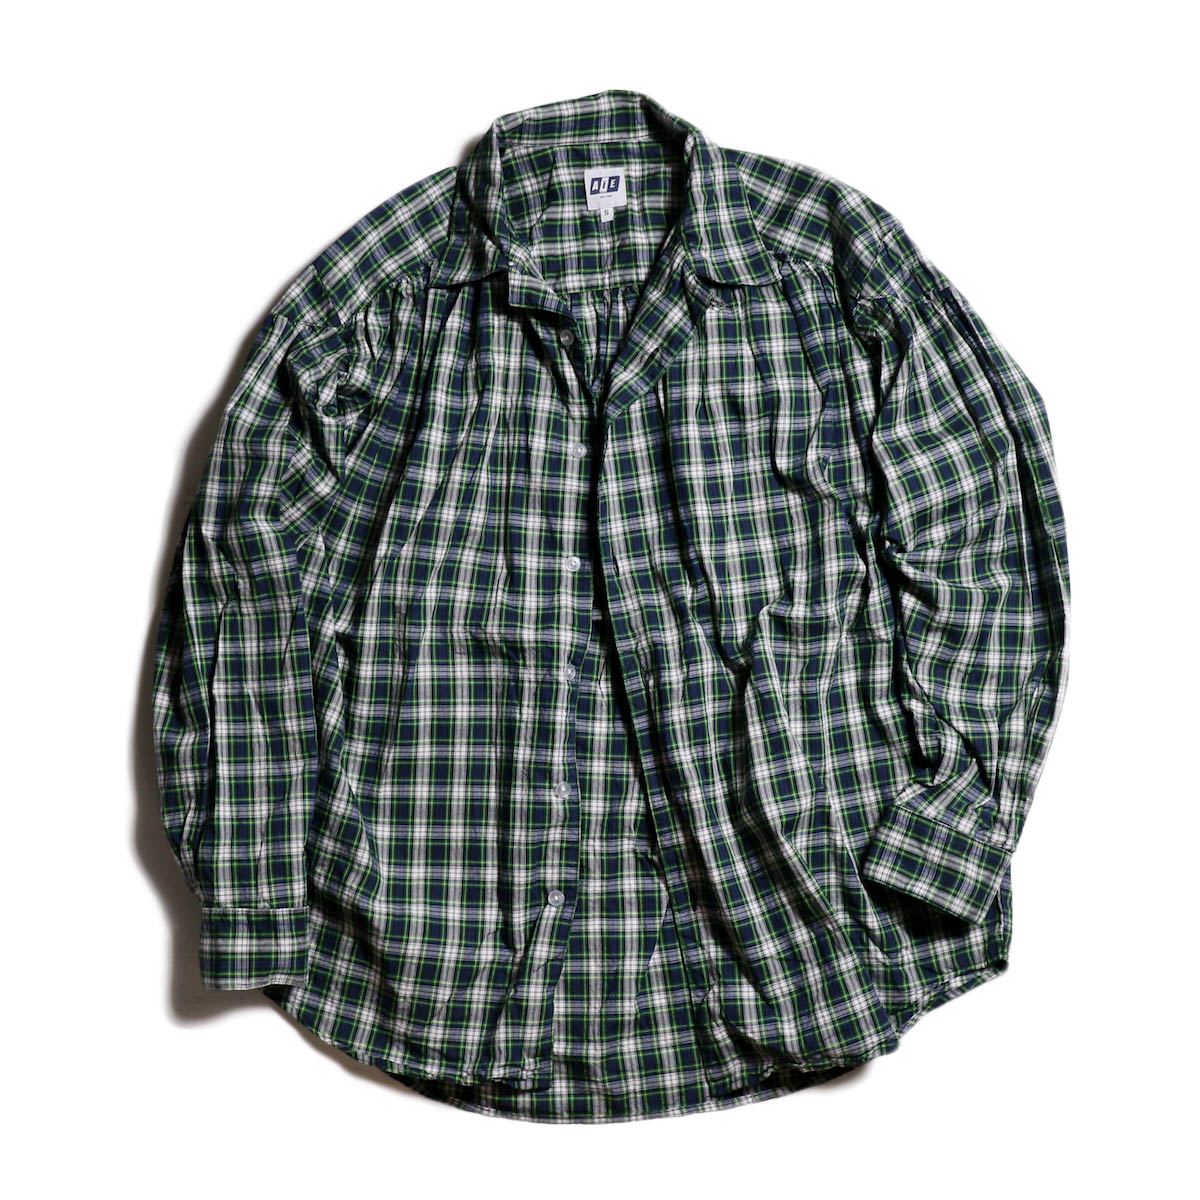 AiE / Painter Shirt -Tartan Check -Grn/Wht